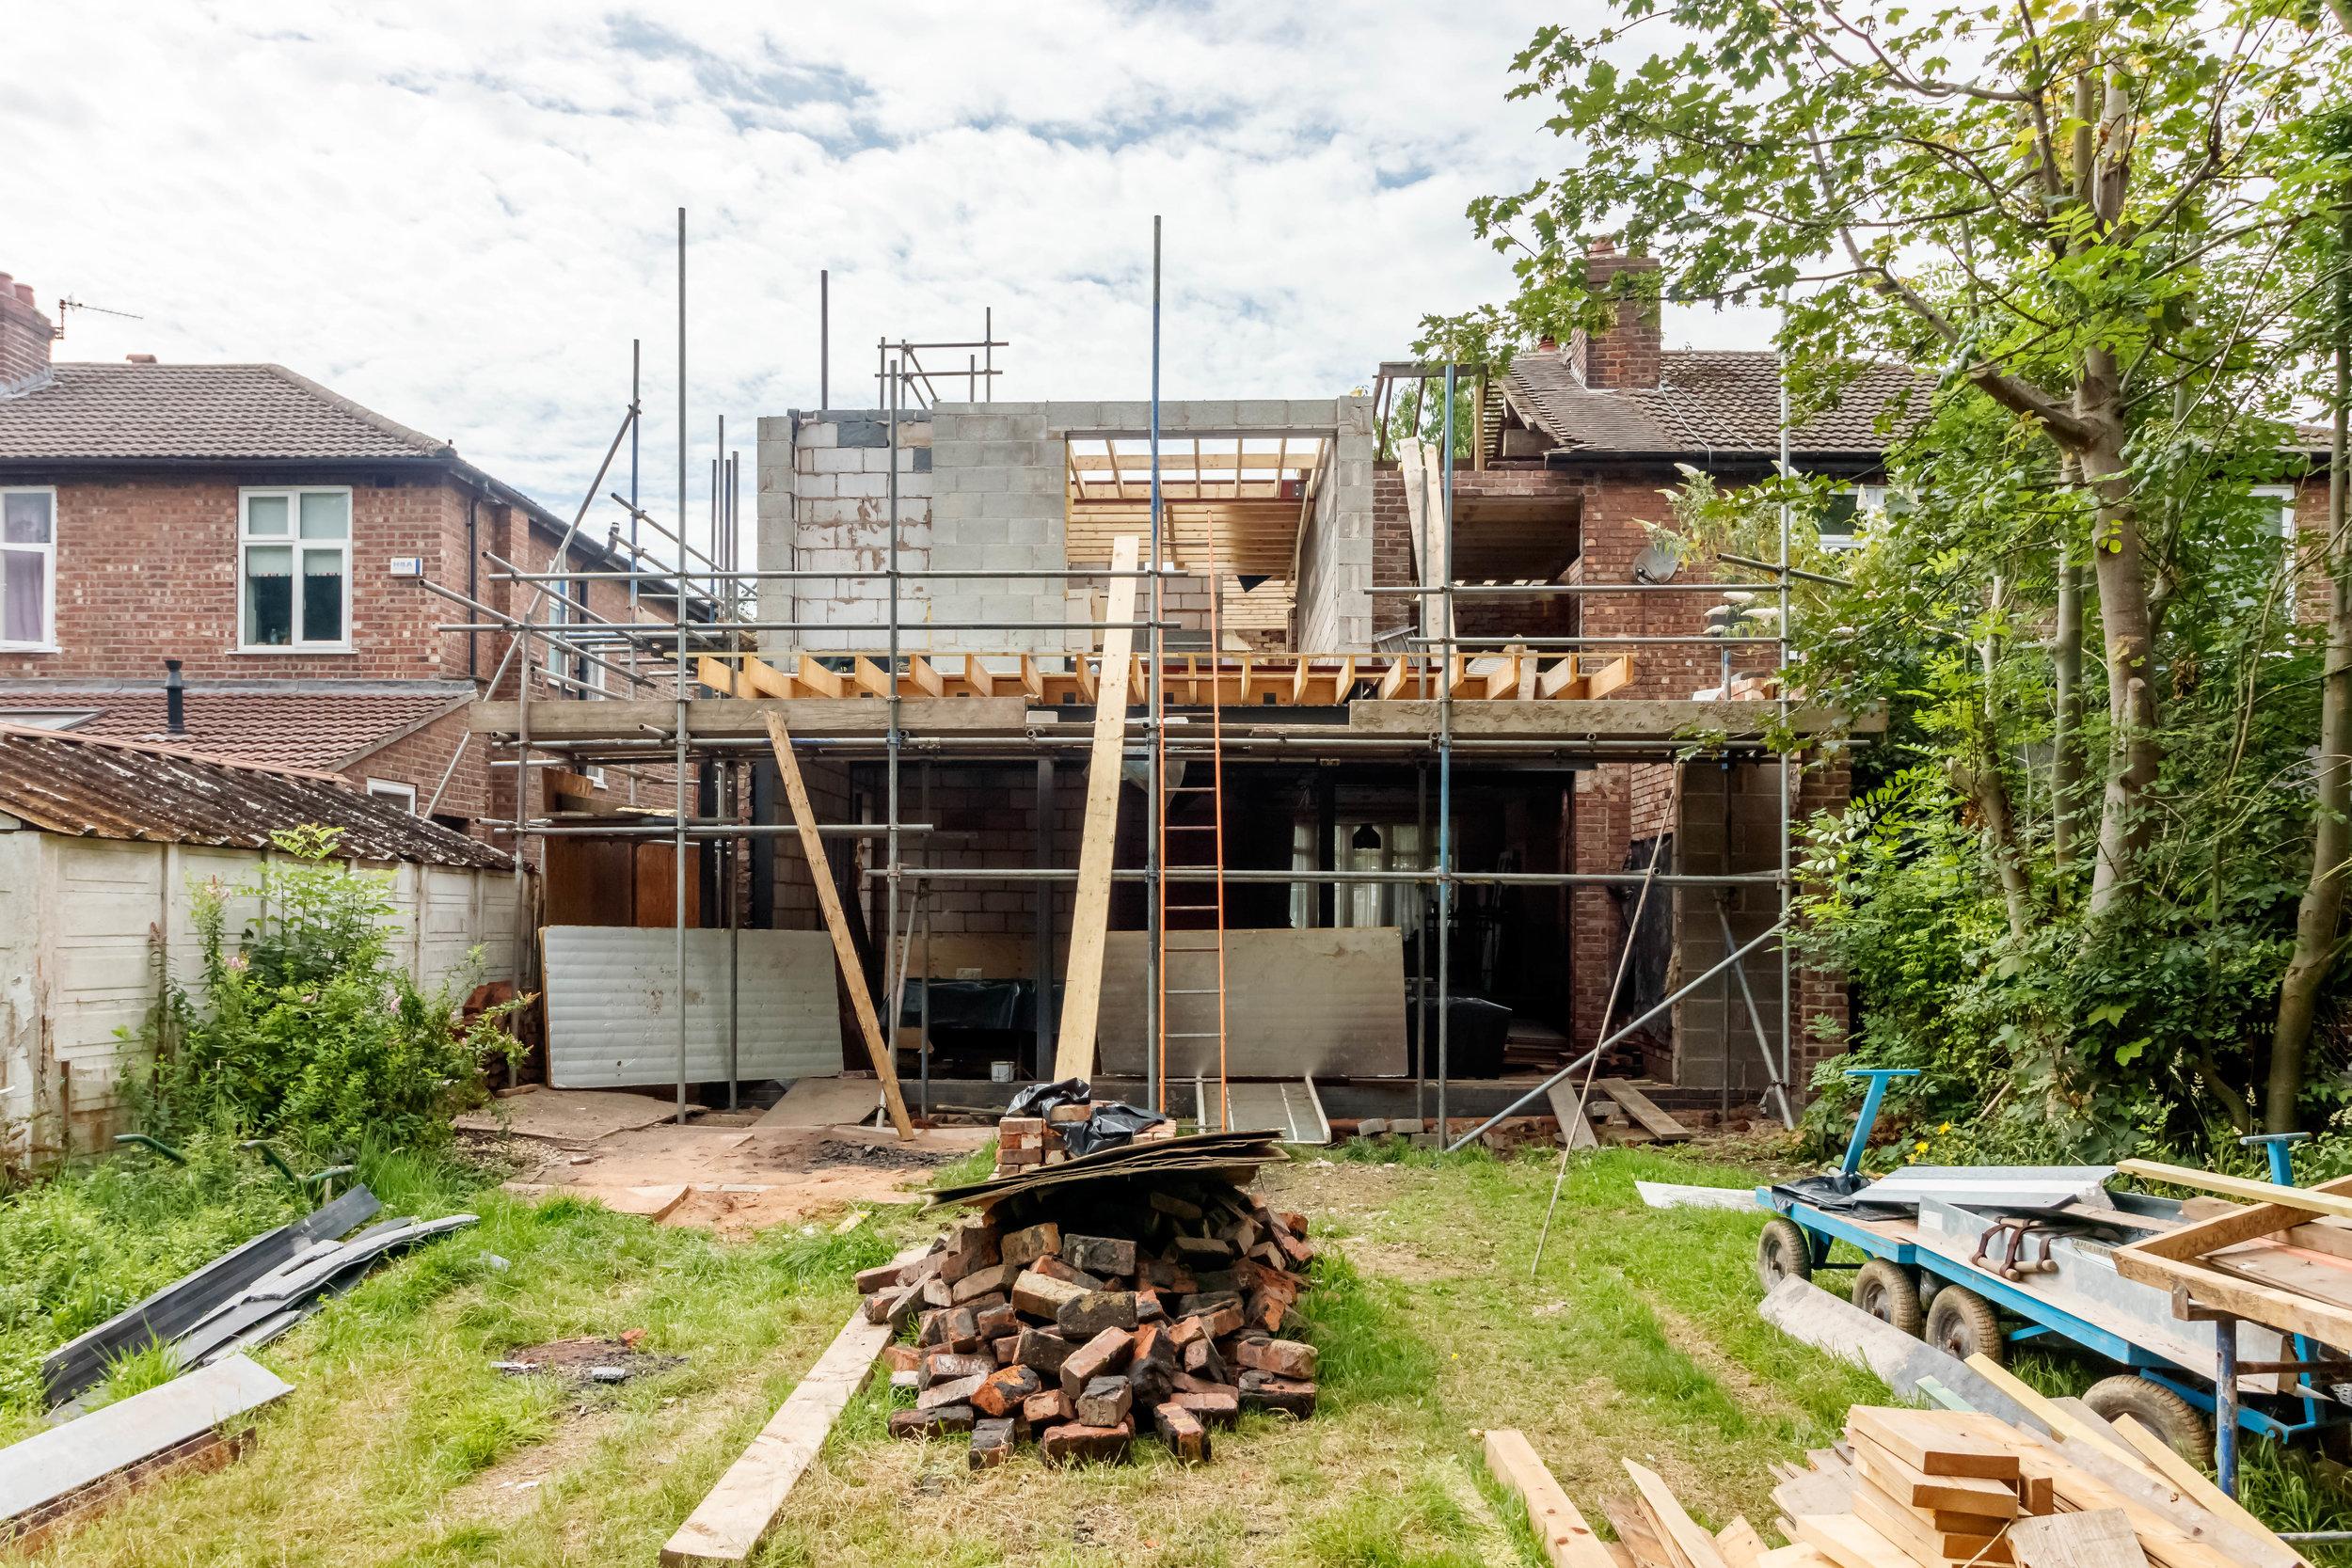 PropertyPhotographs 05188.jpg